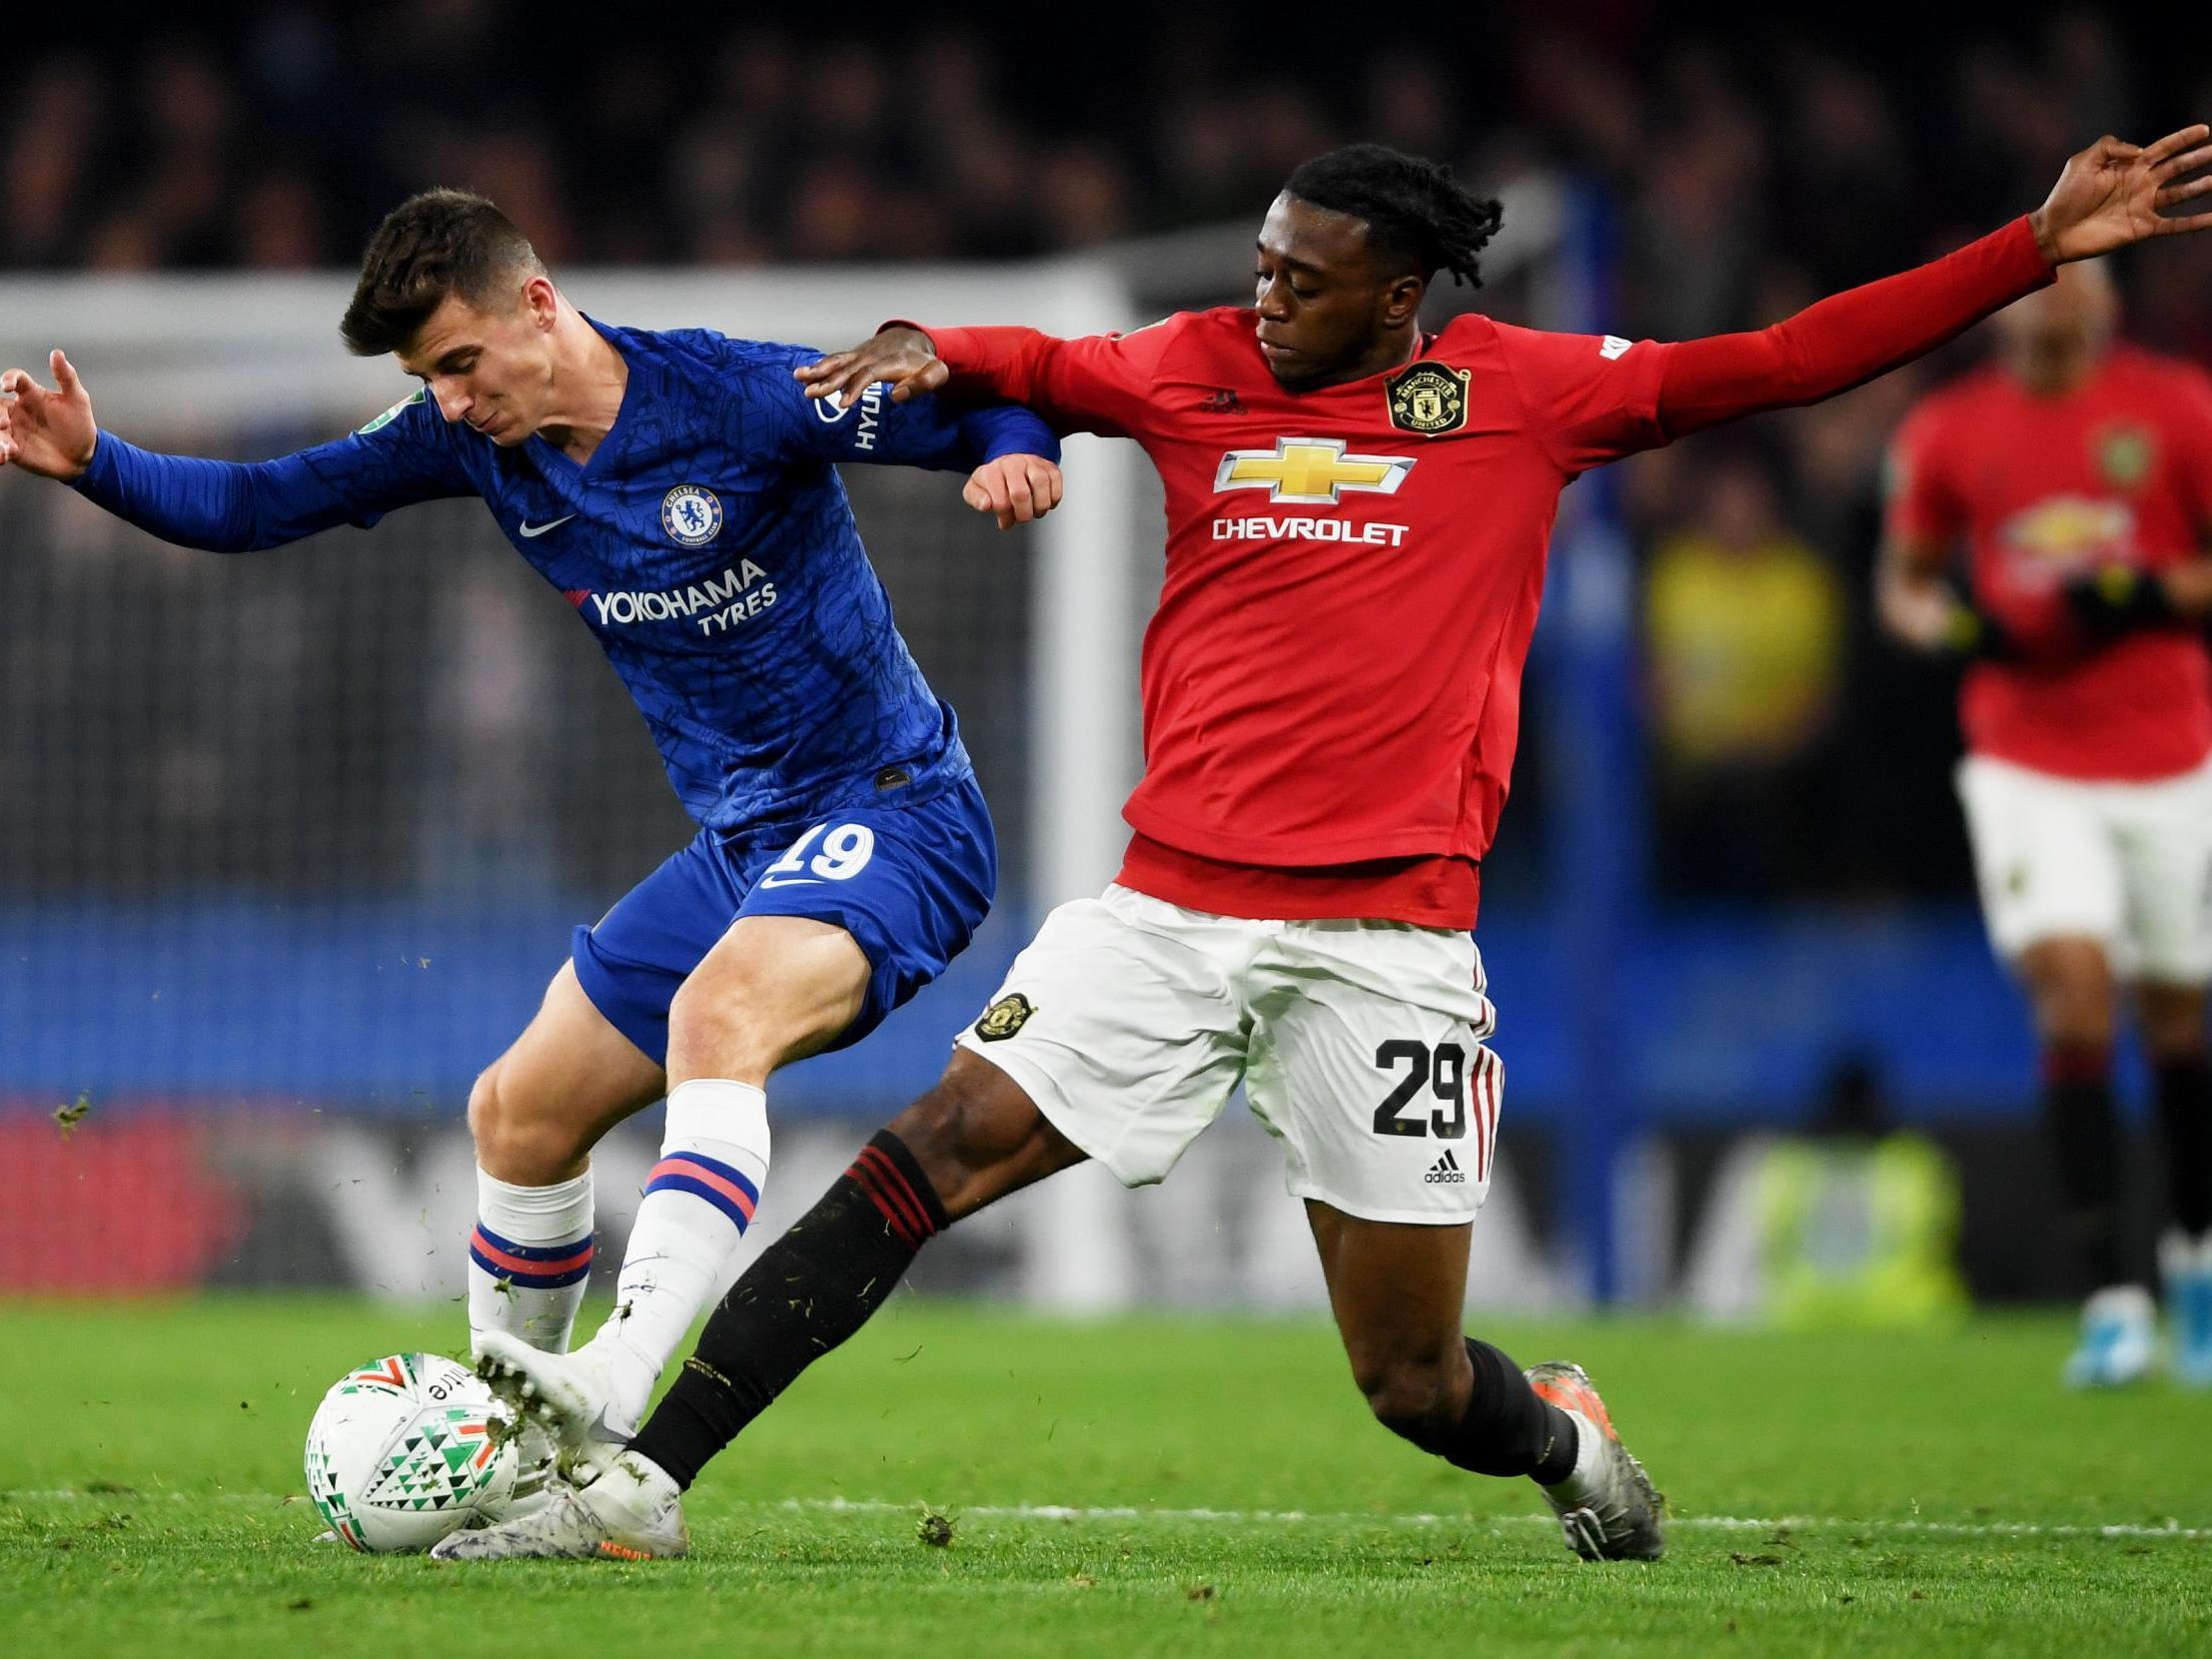 Chelsea vs Manchester United Free Betting Tips - betting-tips.tv